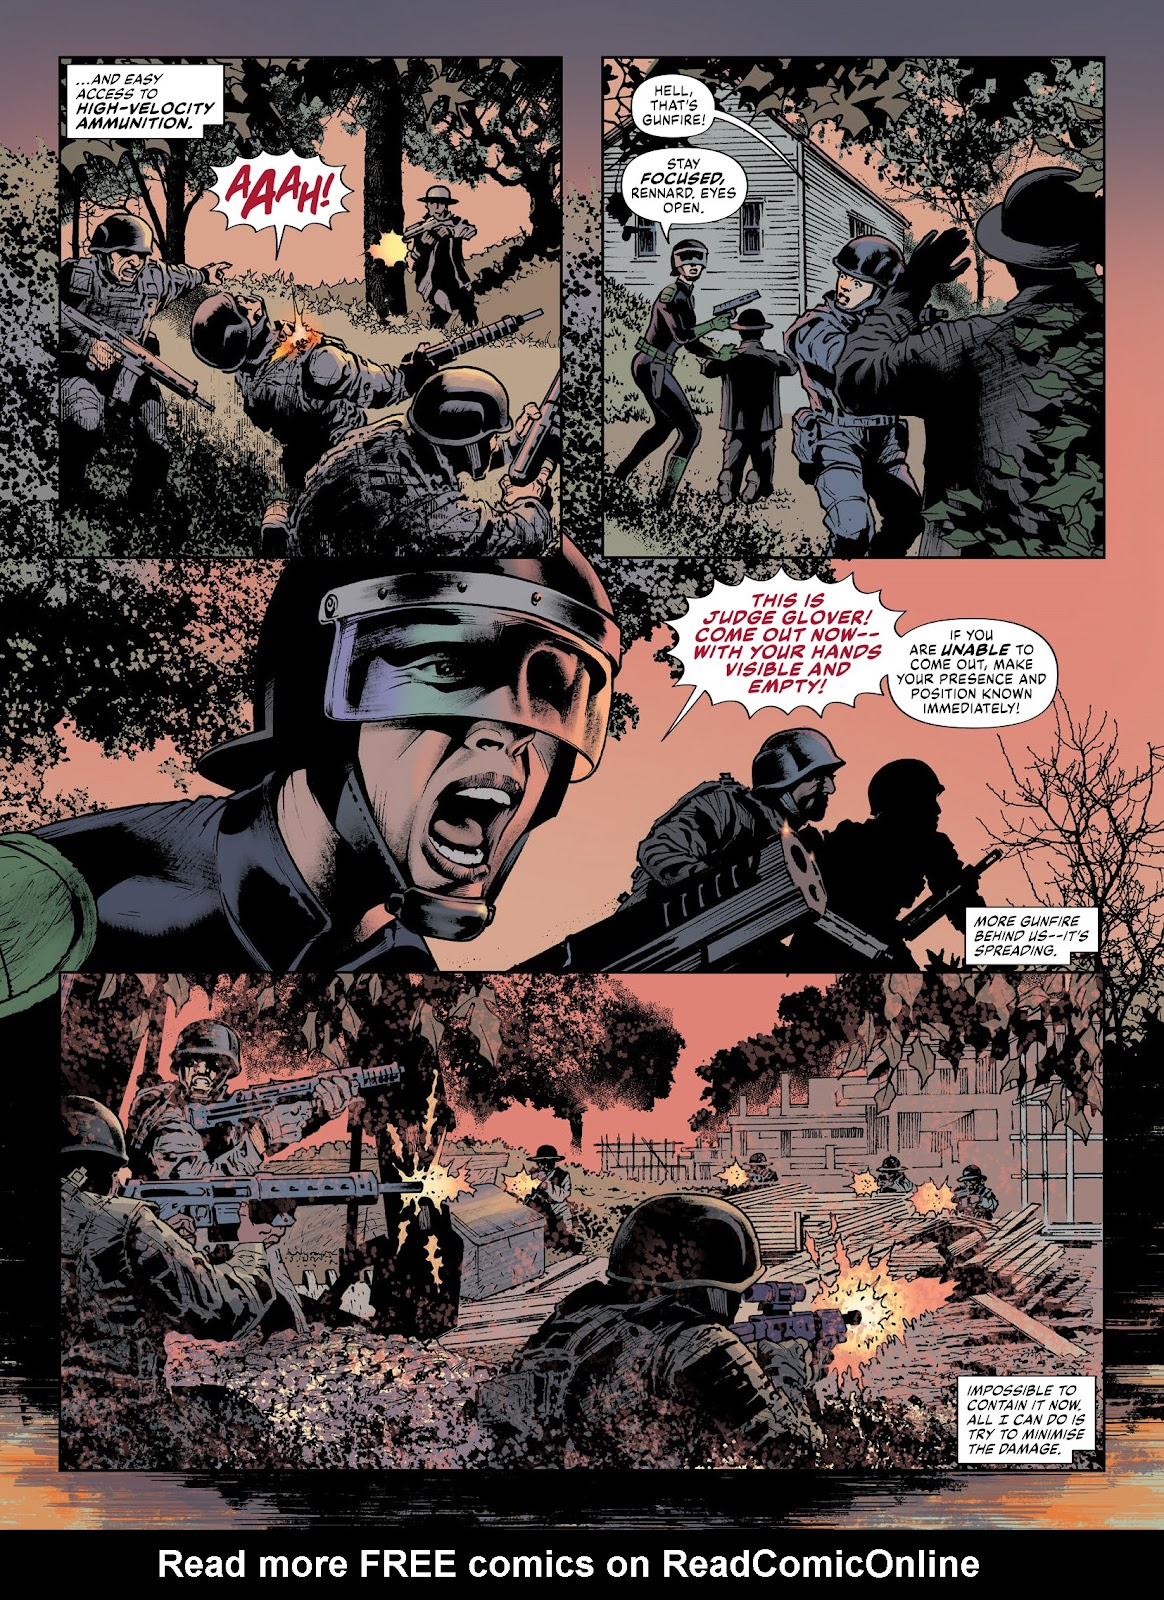 Judge Dredd Megazine (Vol. 5) issue 427 - Page 38